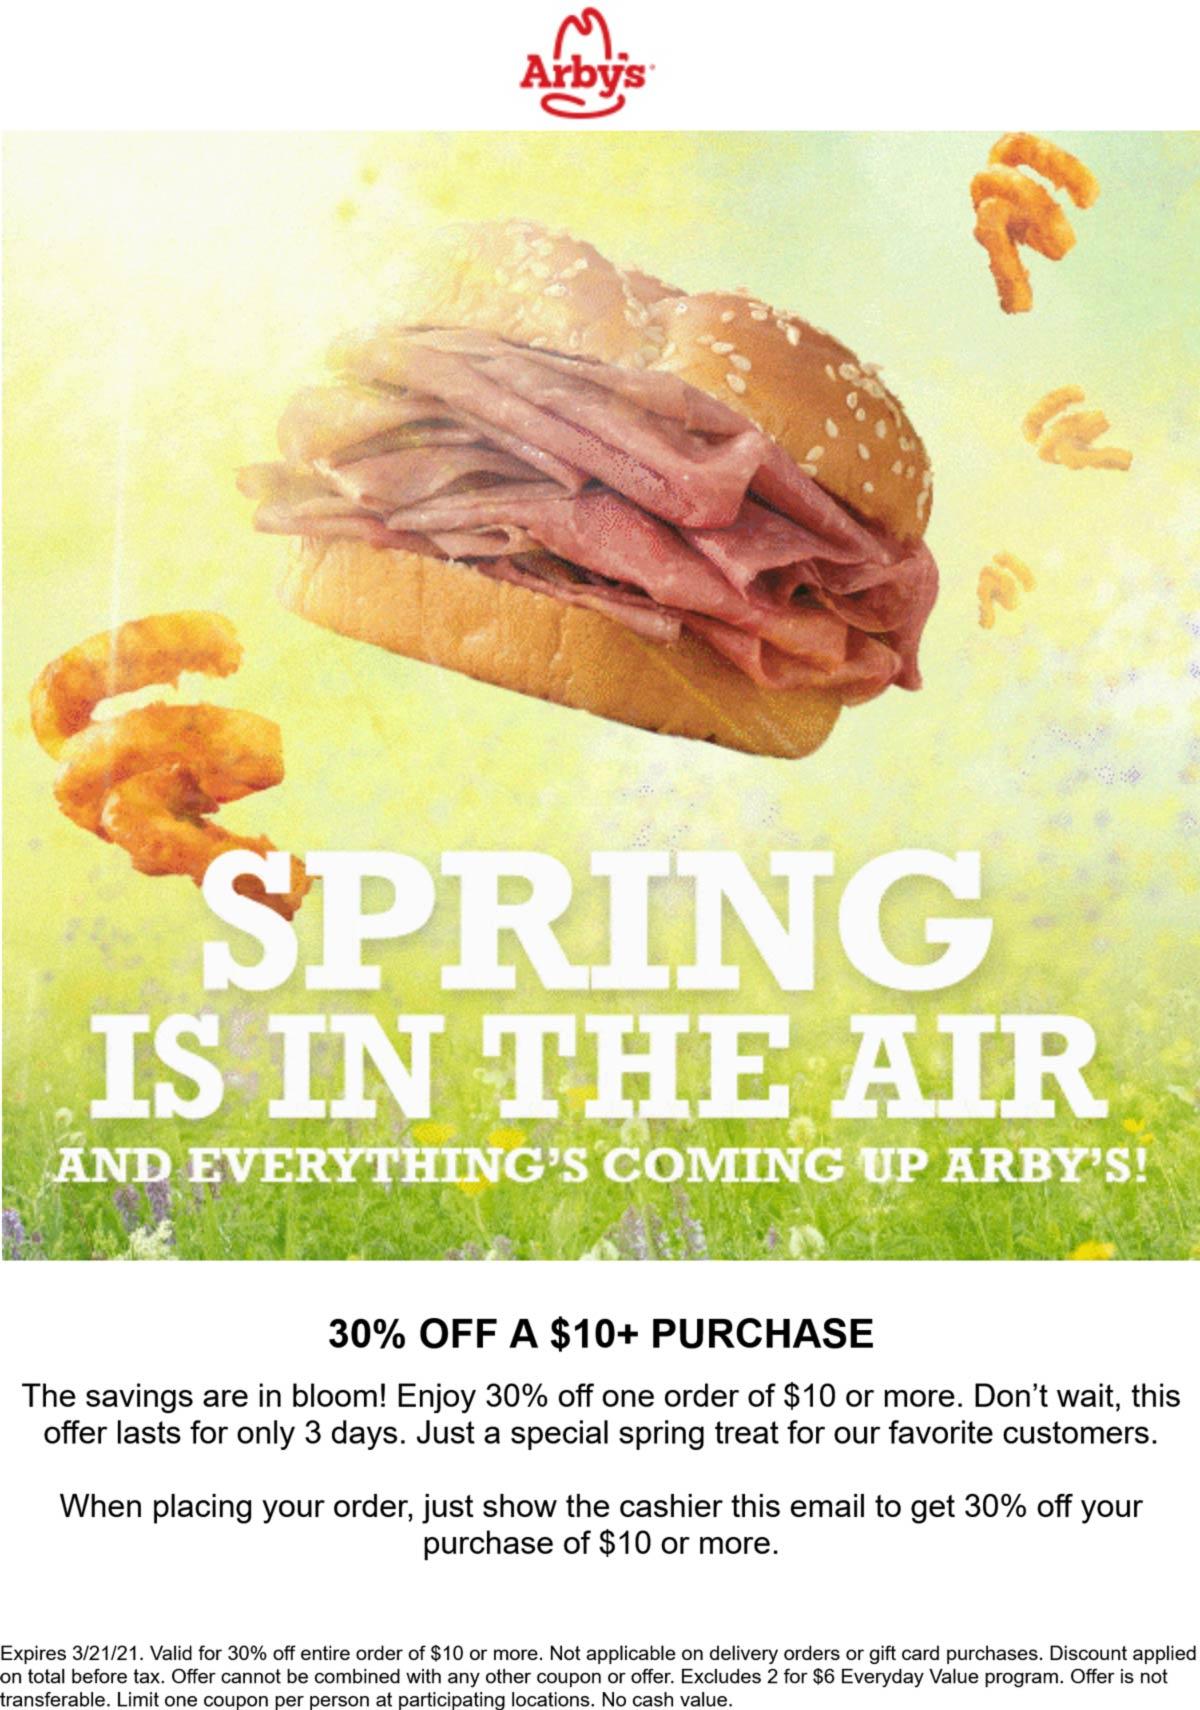 Arbys restaurants Coupon  30% off $10+ at Arbys restaurants #arbys